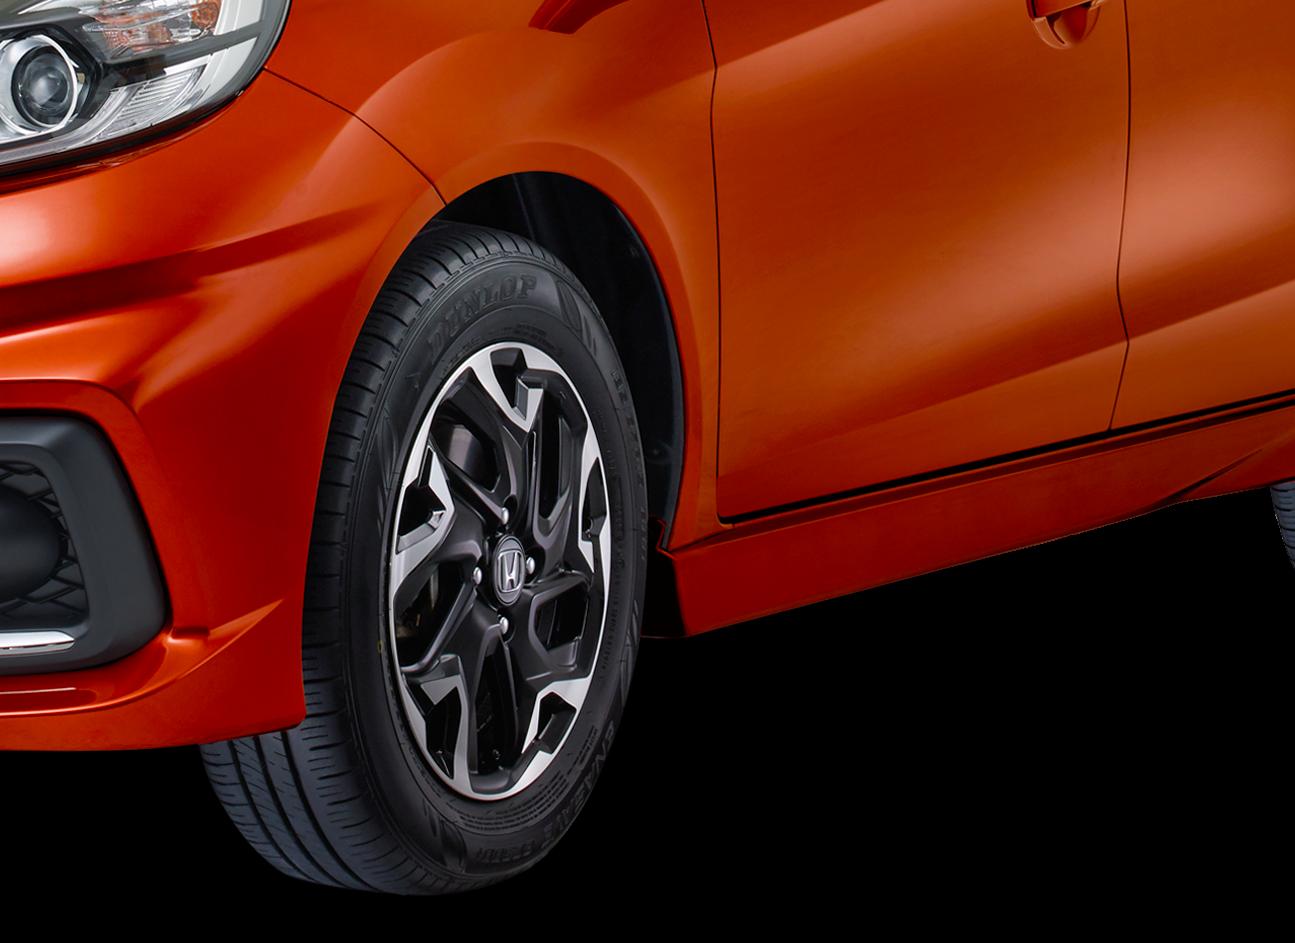 New-1522-Sporty-Alloy-Wheel-Design-Tipe-RS